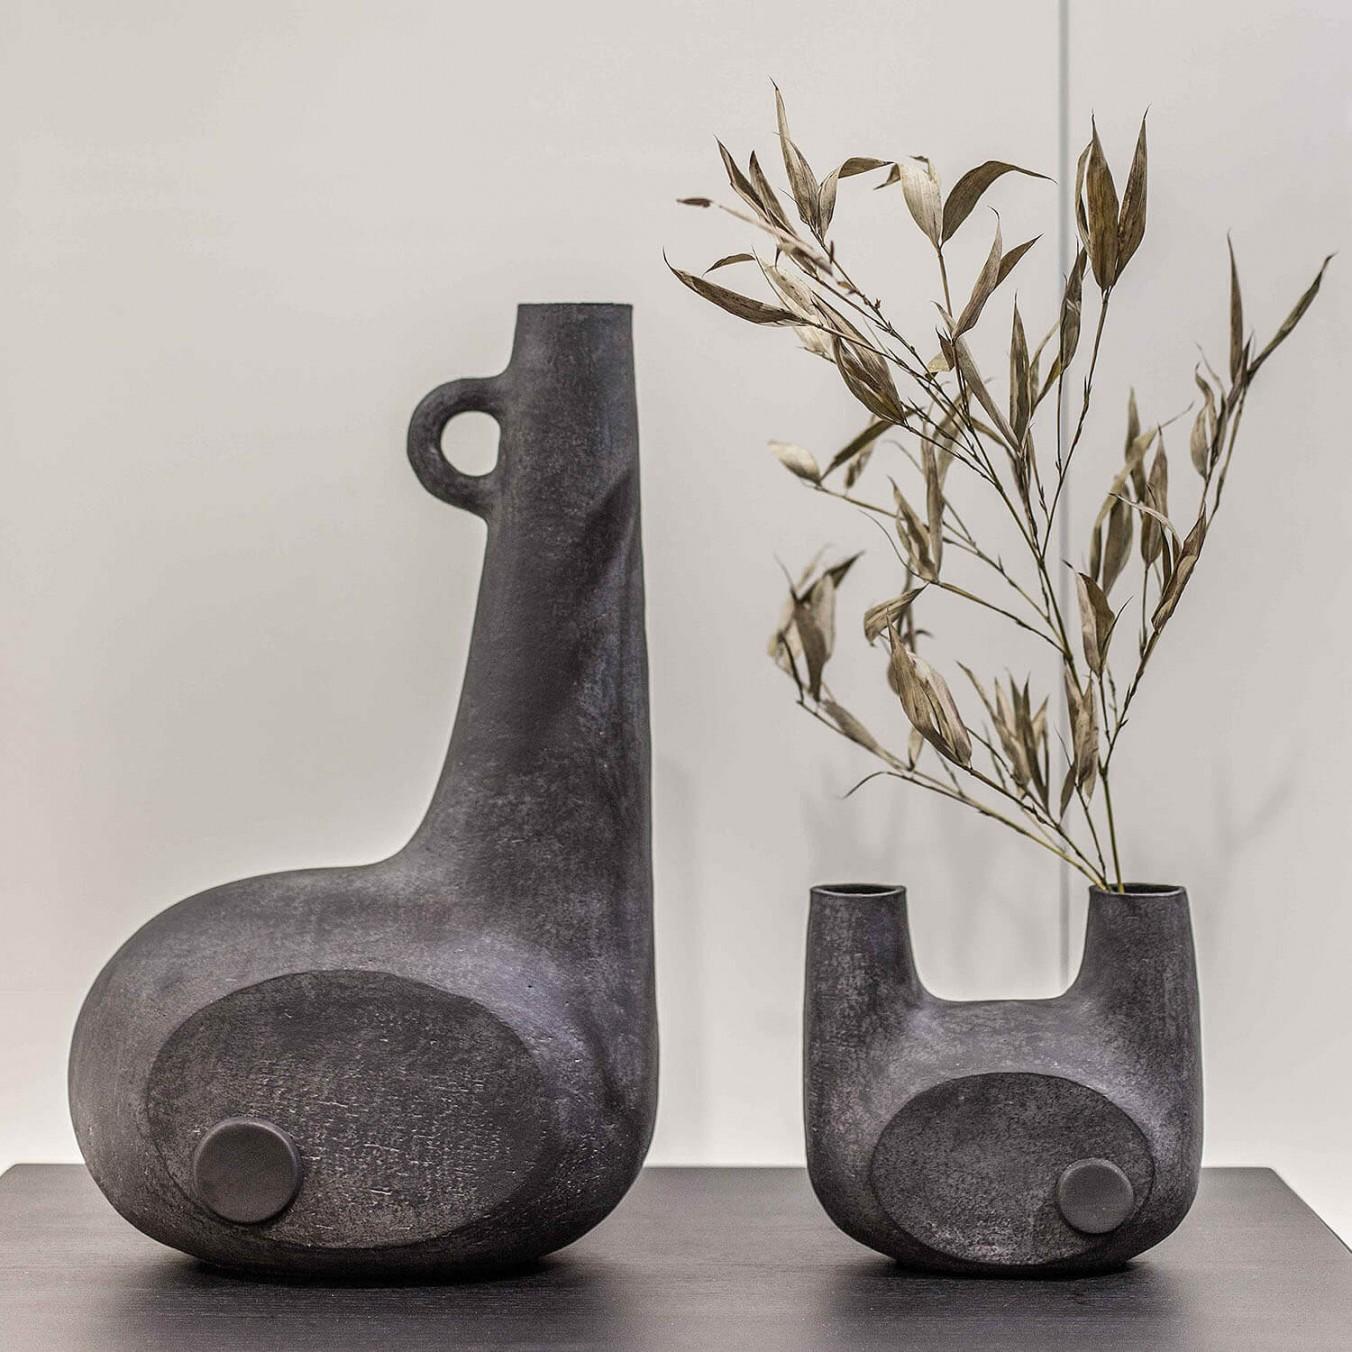 Sculptural black vases from Kooku